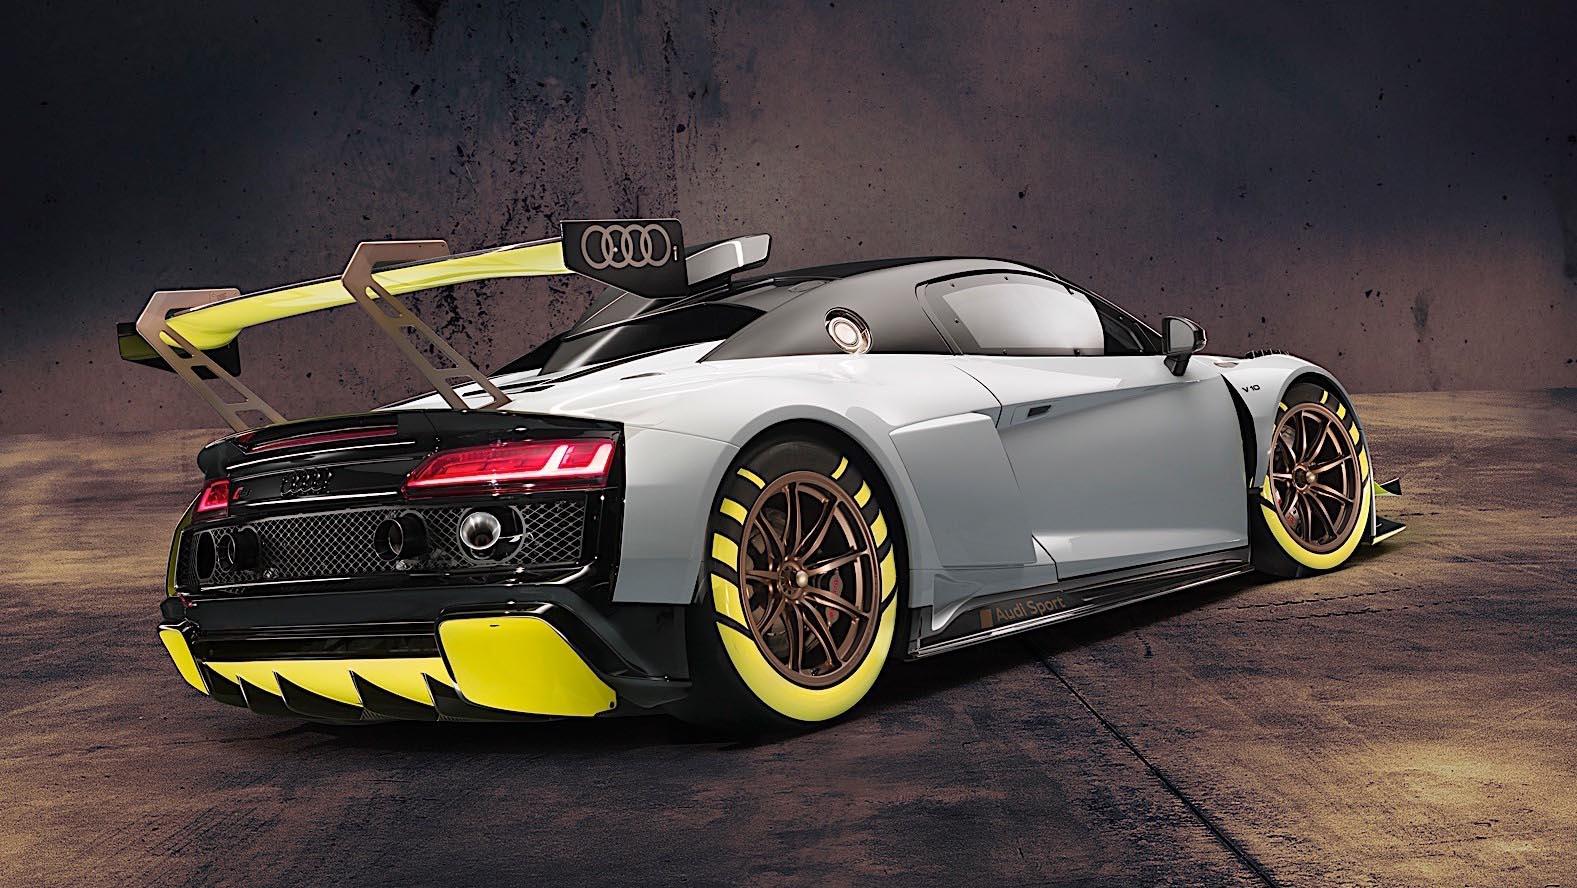 2020 Audi R8 LMS GT2 вид сзади